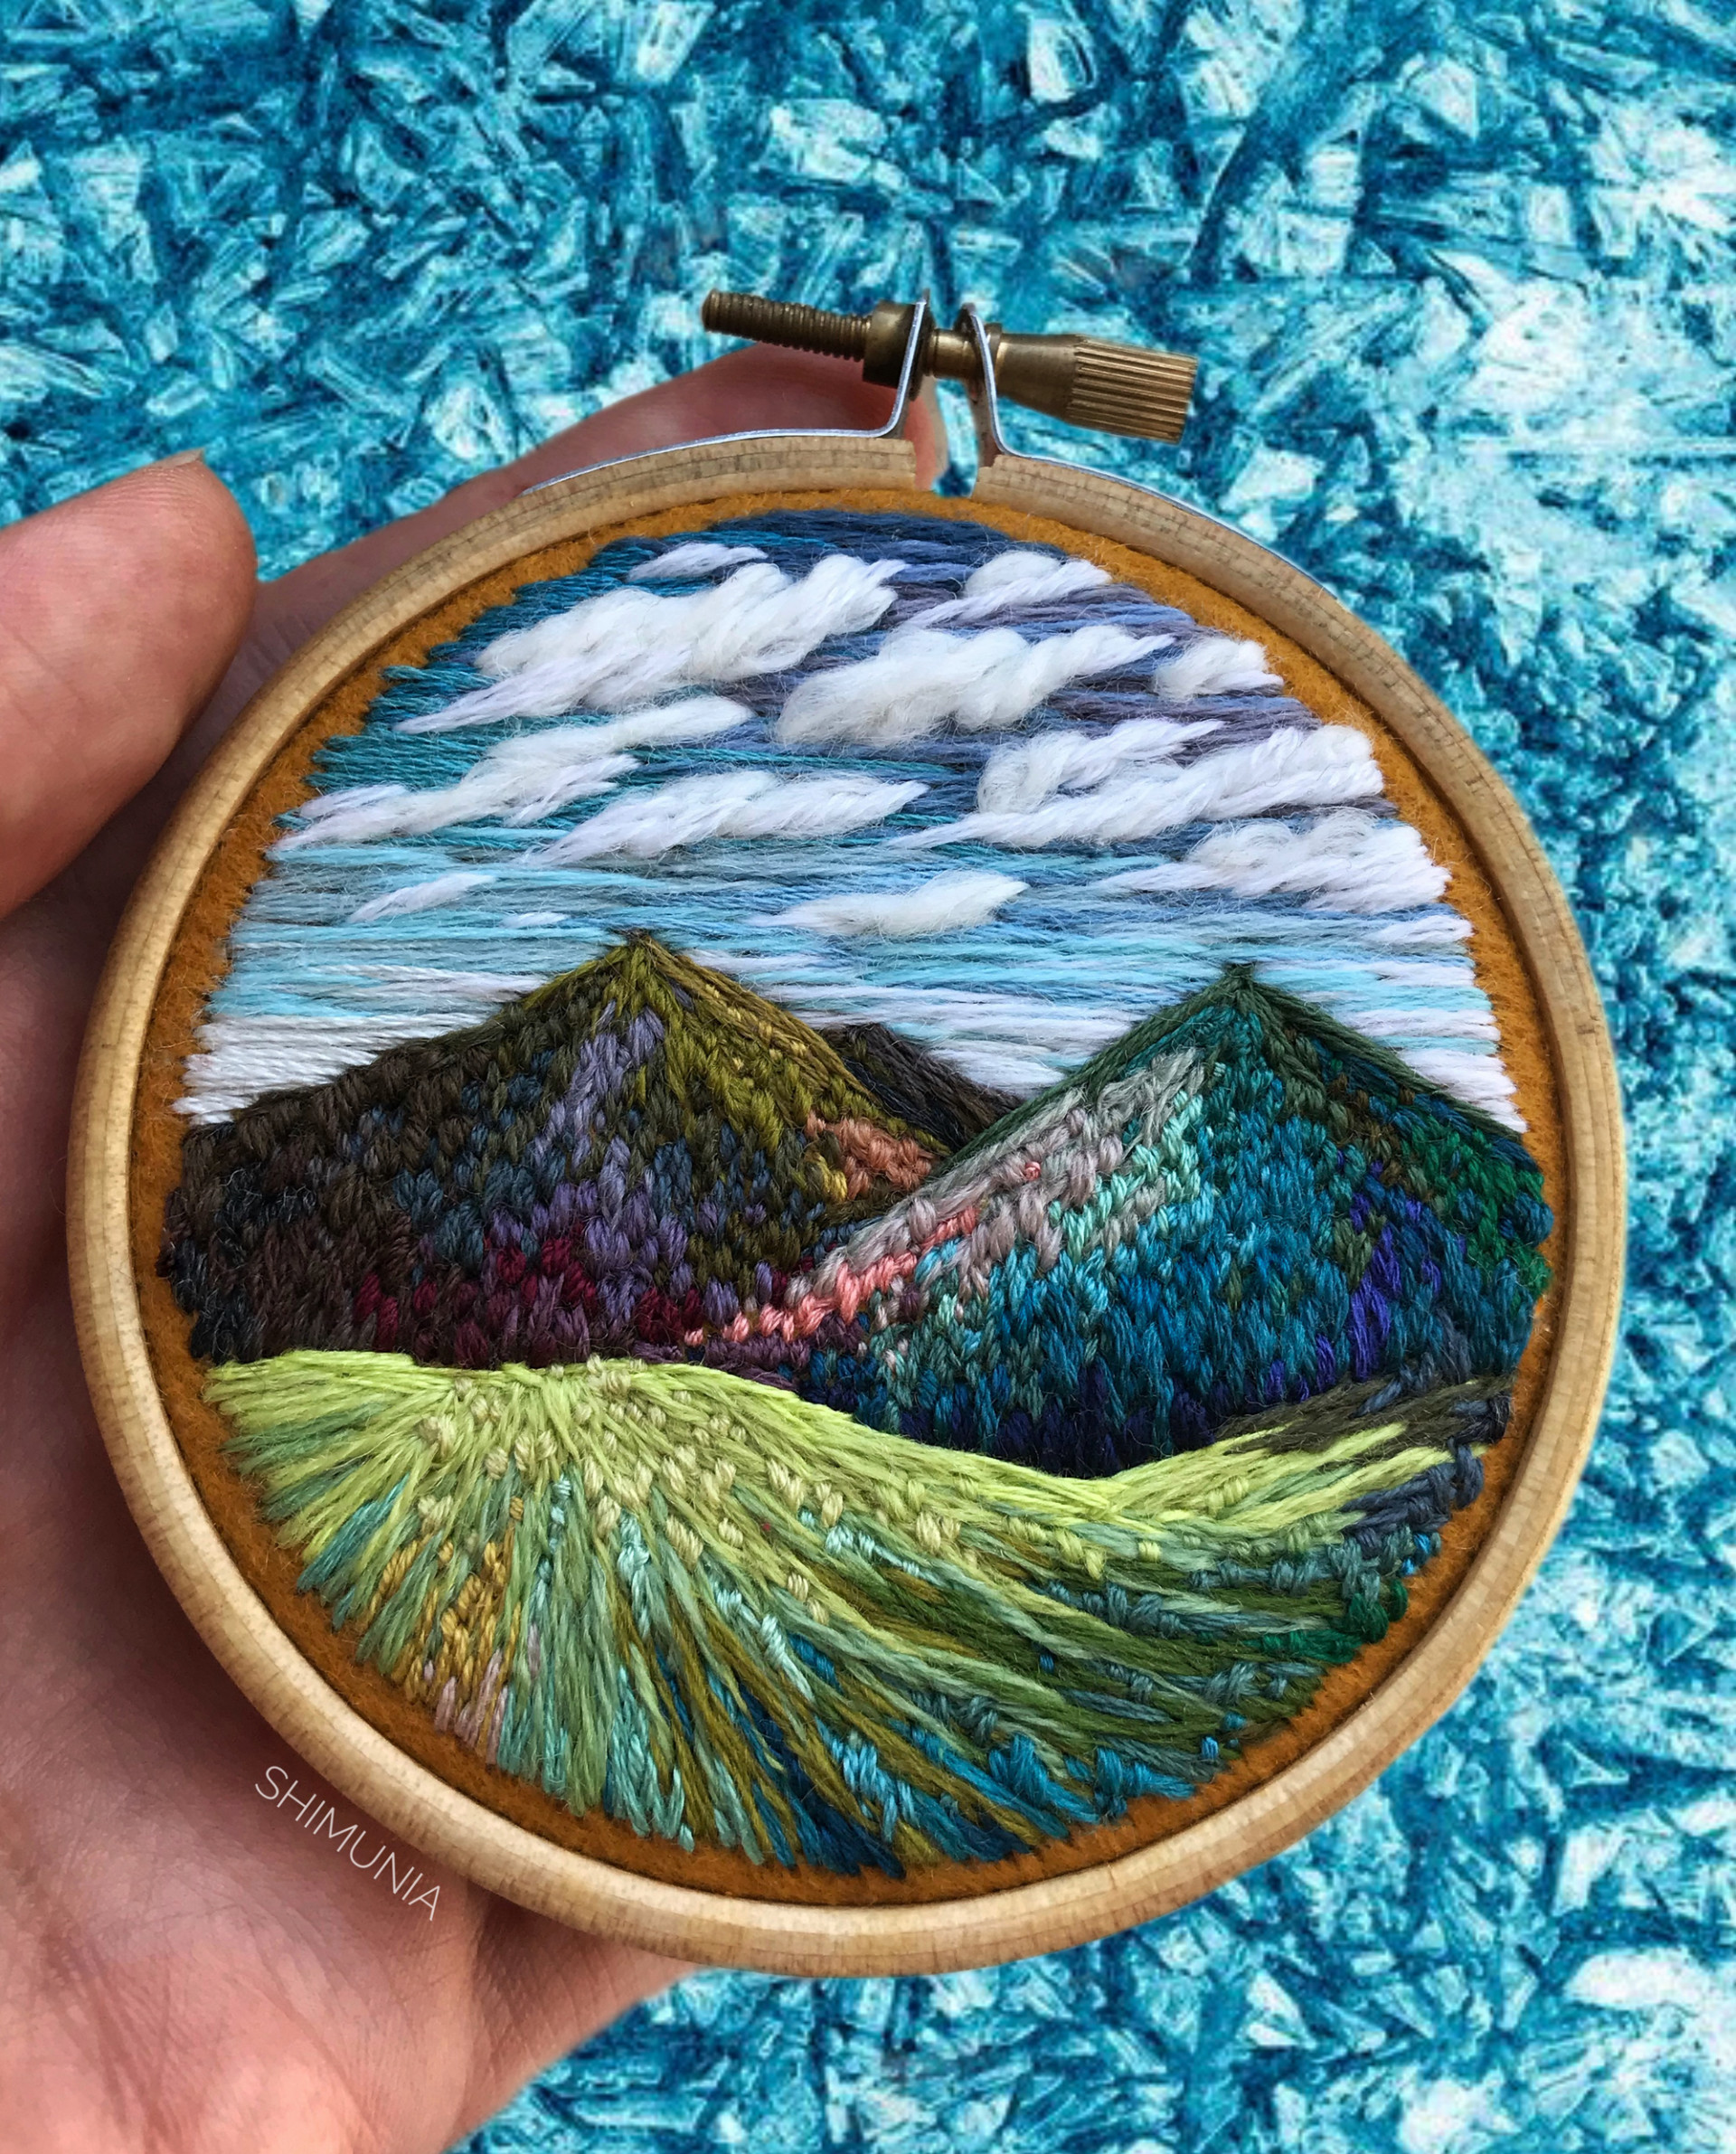 embroidery-4-960x1191@2x.jpg